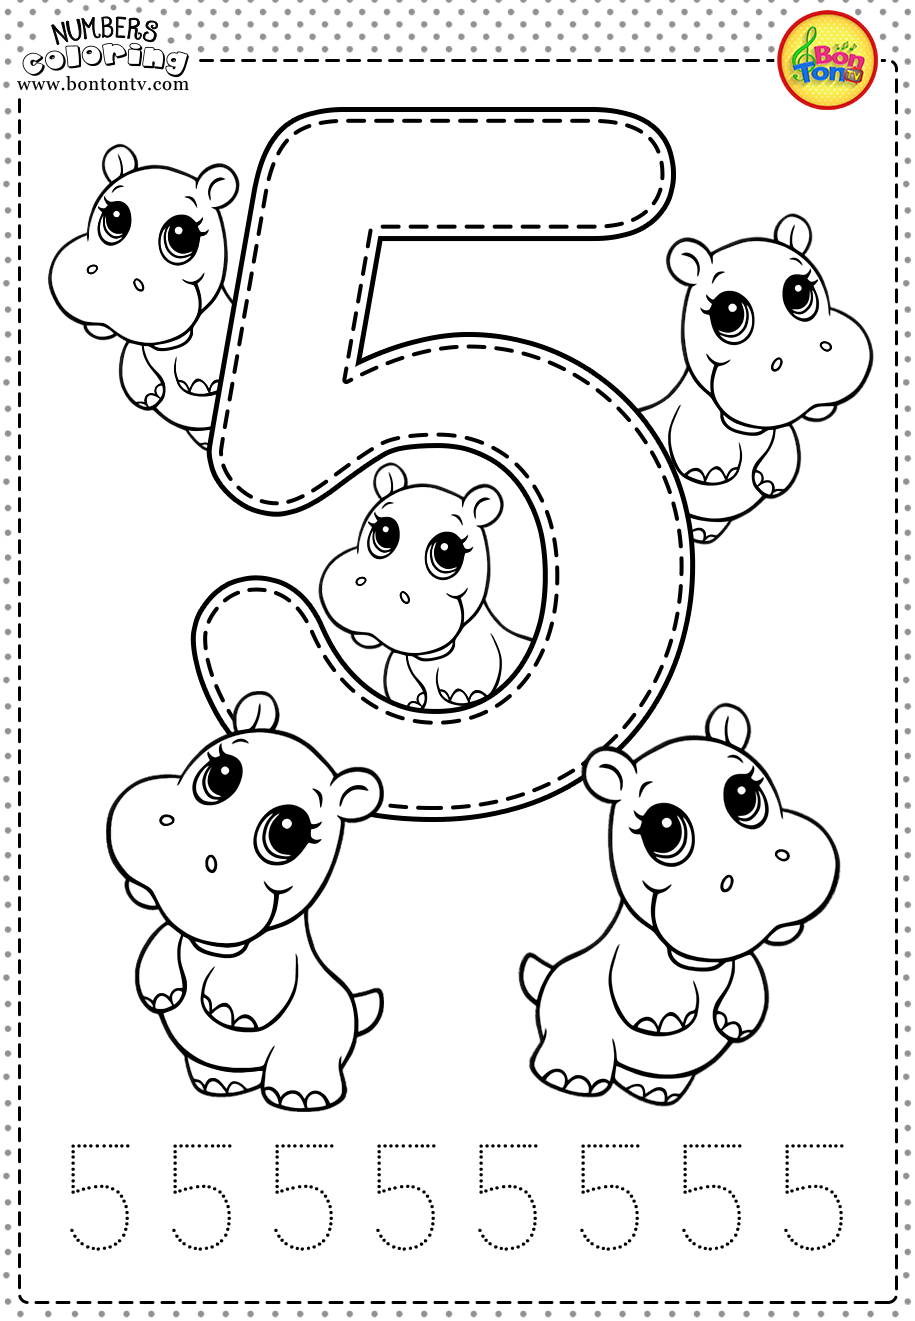 Number 26 - Preschool Printables - Free Worksheets and Coloring